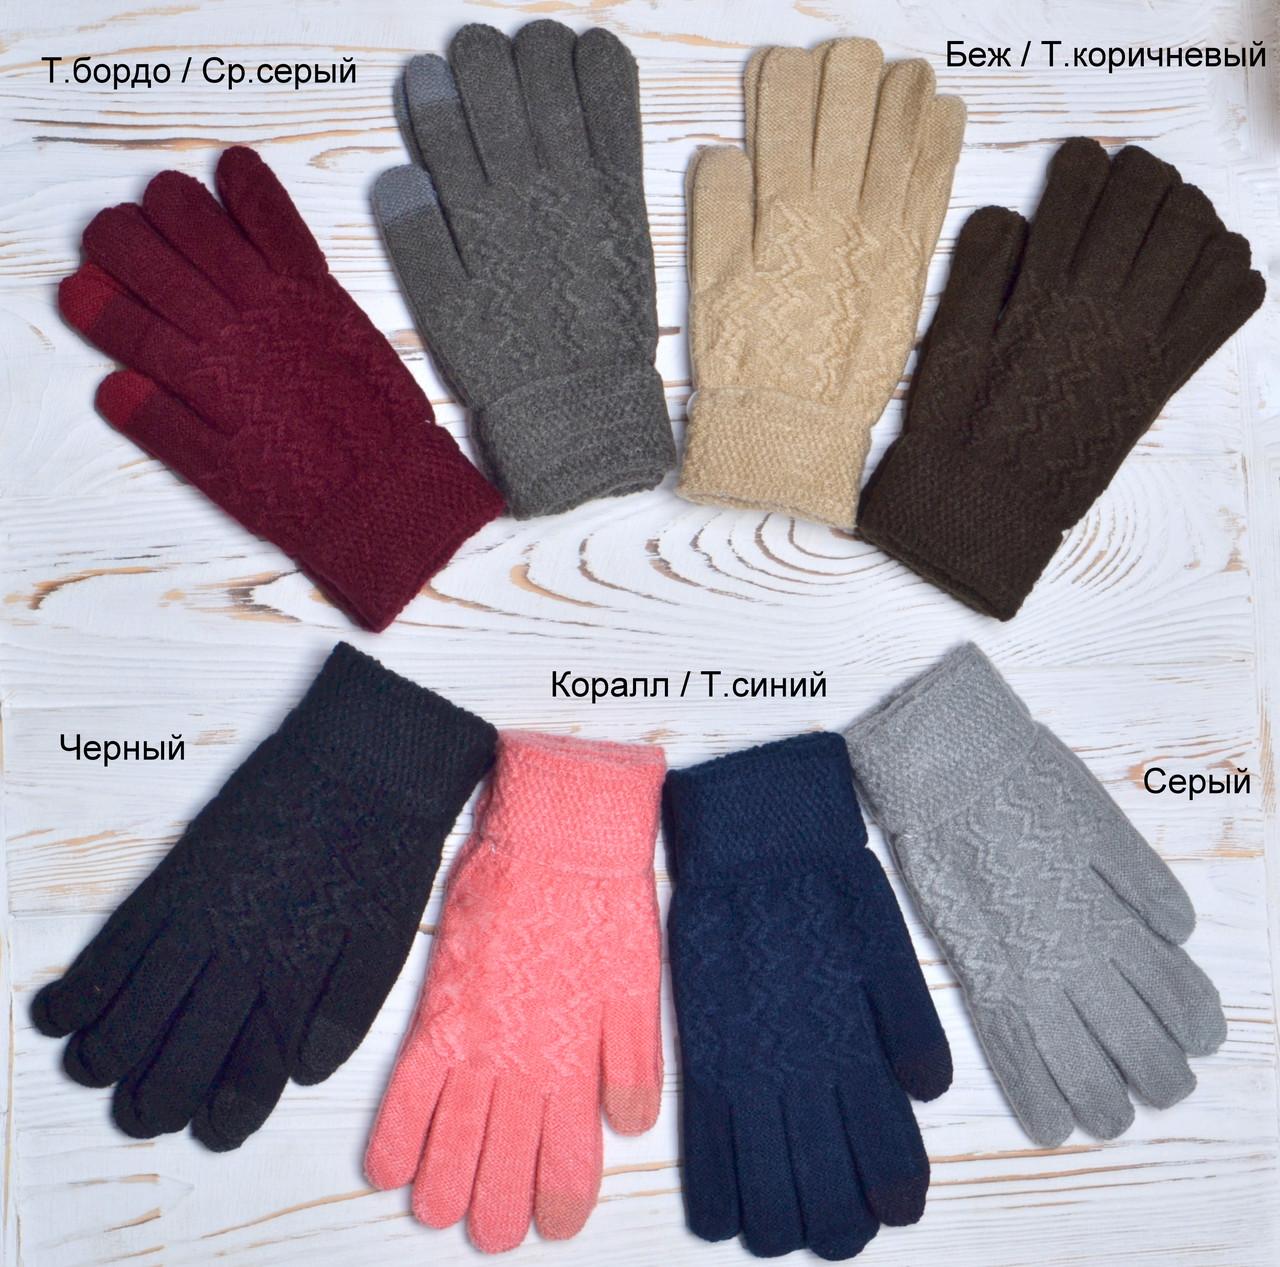 №411 Айфон сенсорные перчатки. -15%  (35,7 грн) поштучно, св.коралл -20%(33,60 грн)